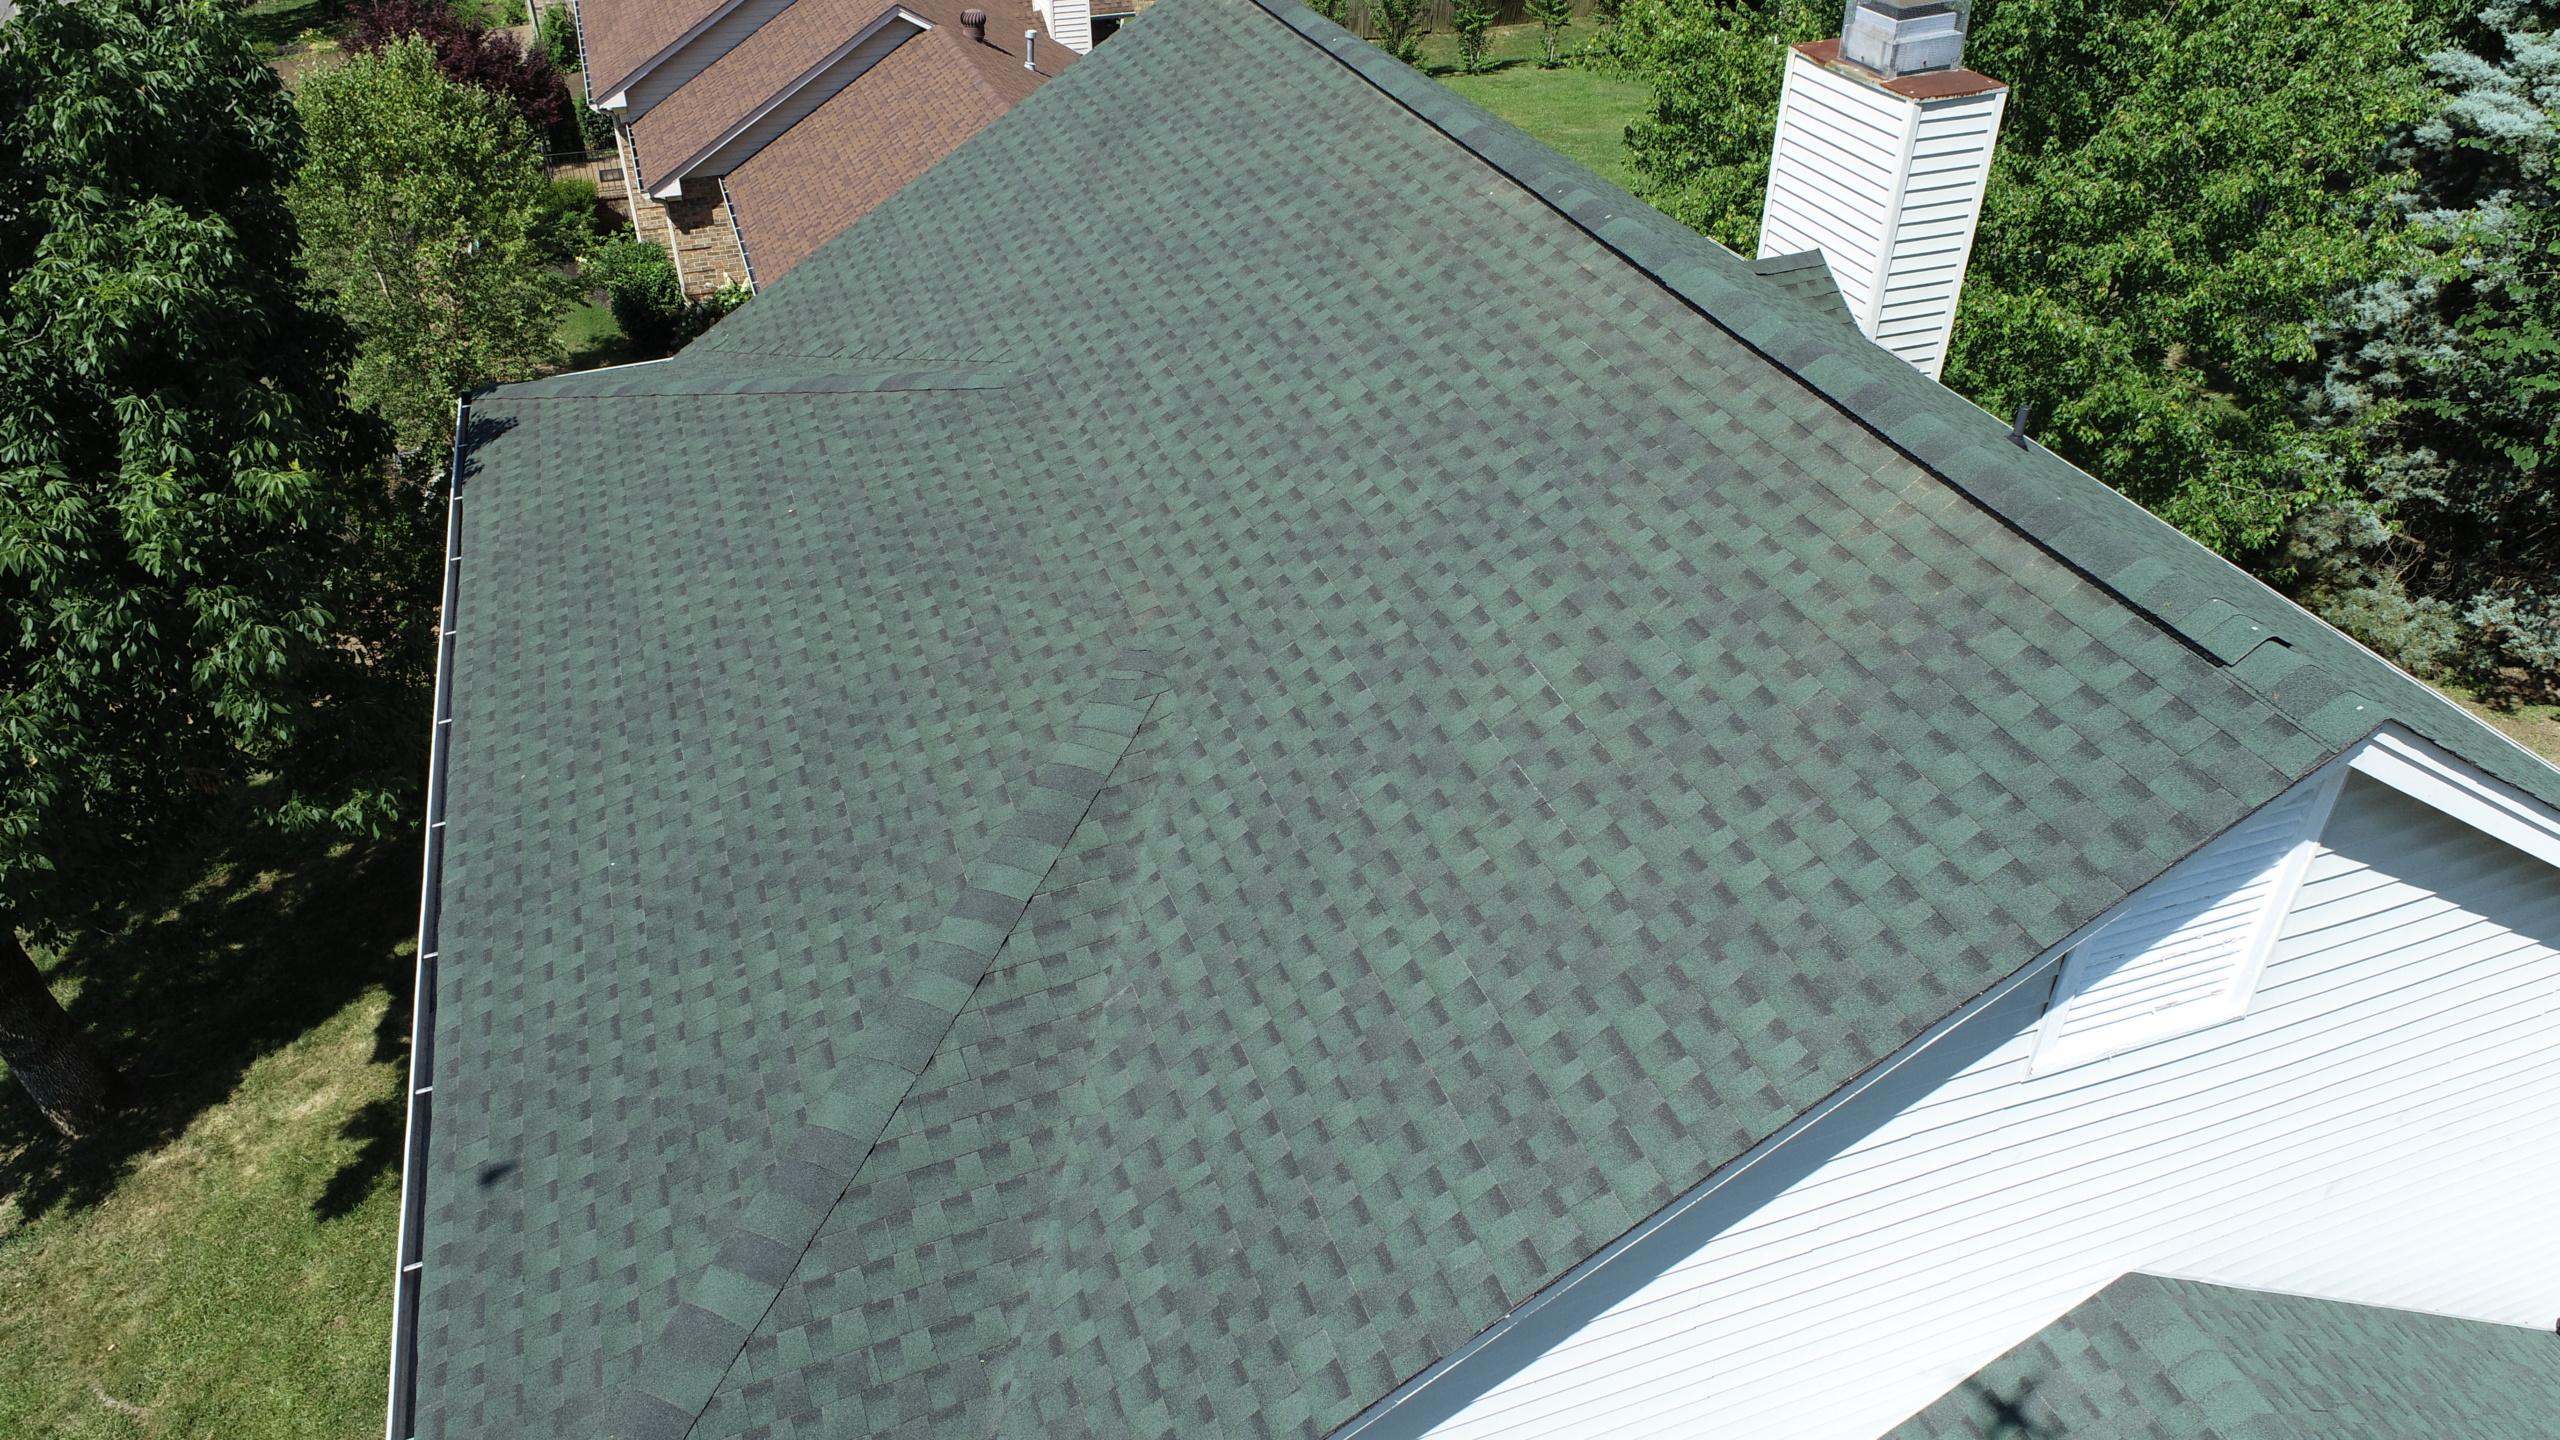 Murfreesboro Roofers GAF Timberline Hunter Green 3